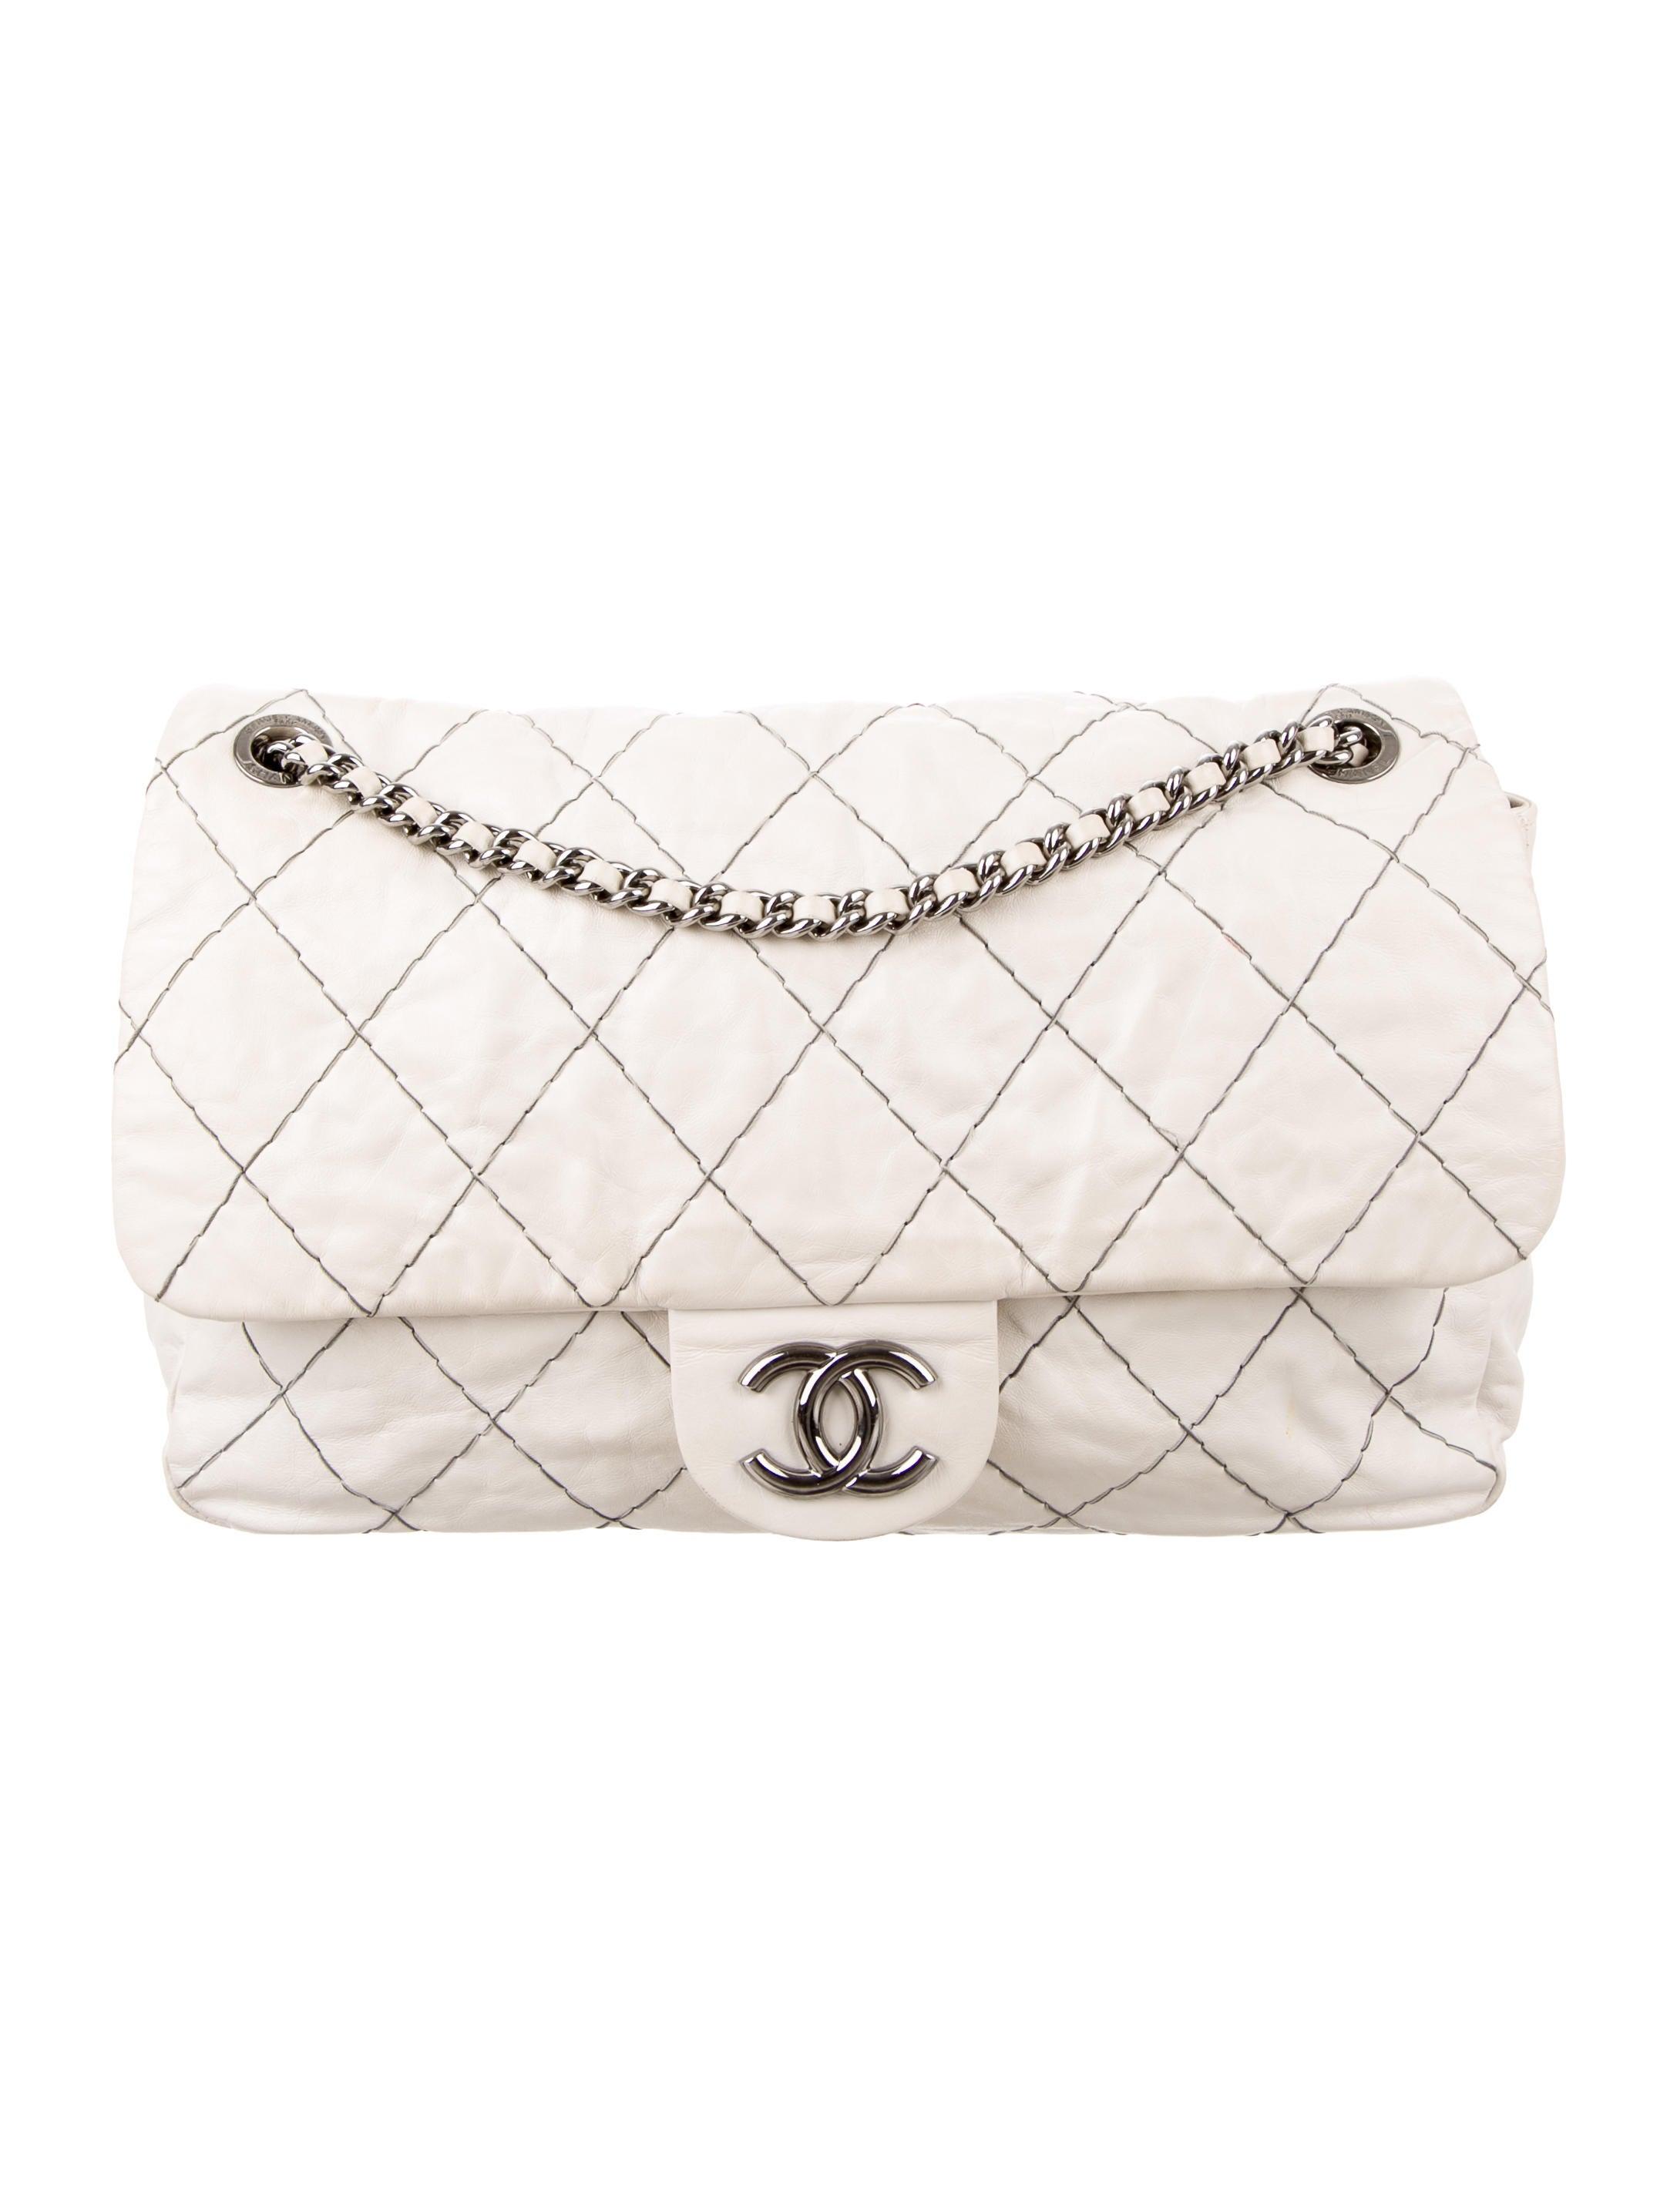 68adf24ae36241 Chanel Double Stitch Jumbo Flap Bag - Handbags - CHA149830 | The ...